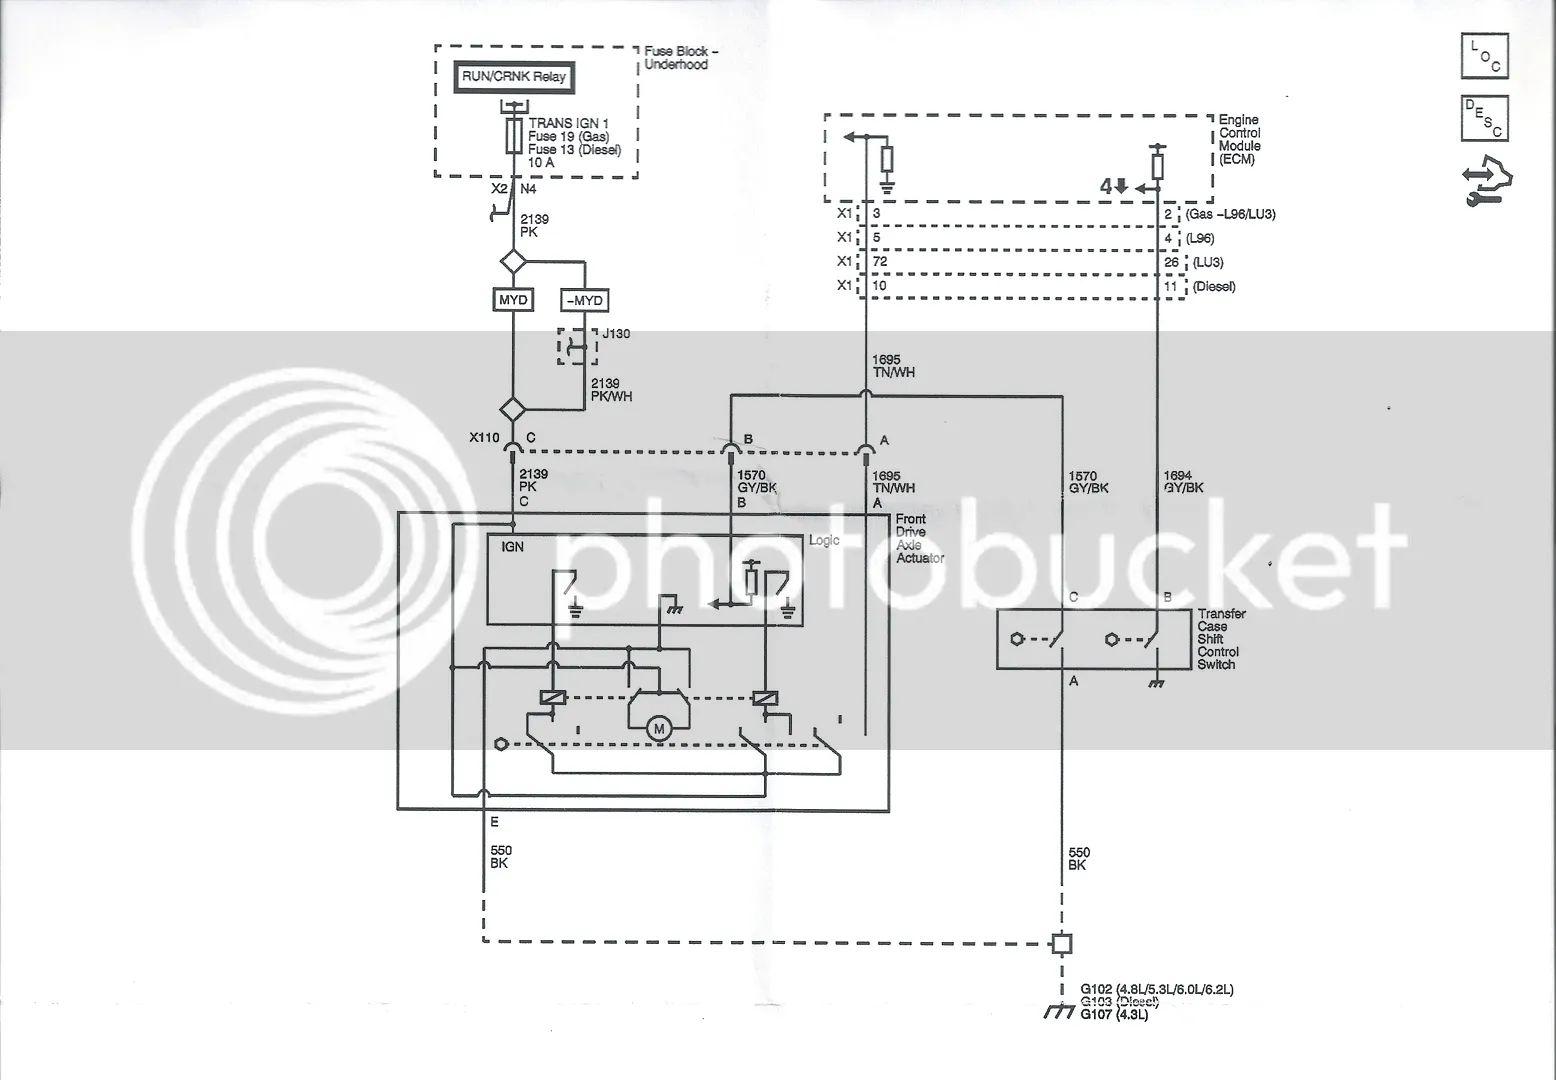 pace edwards bedlocker wiring diagram